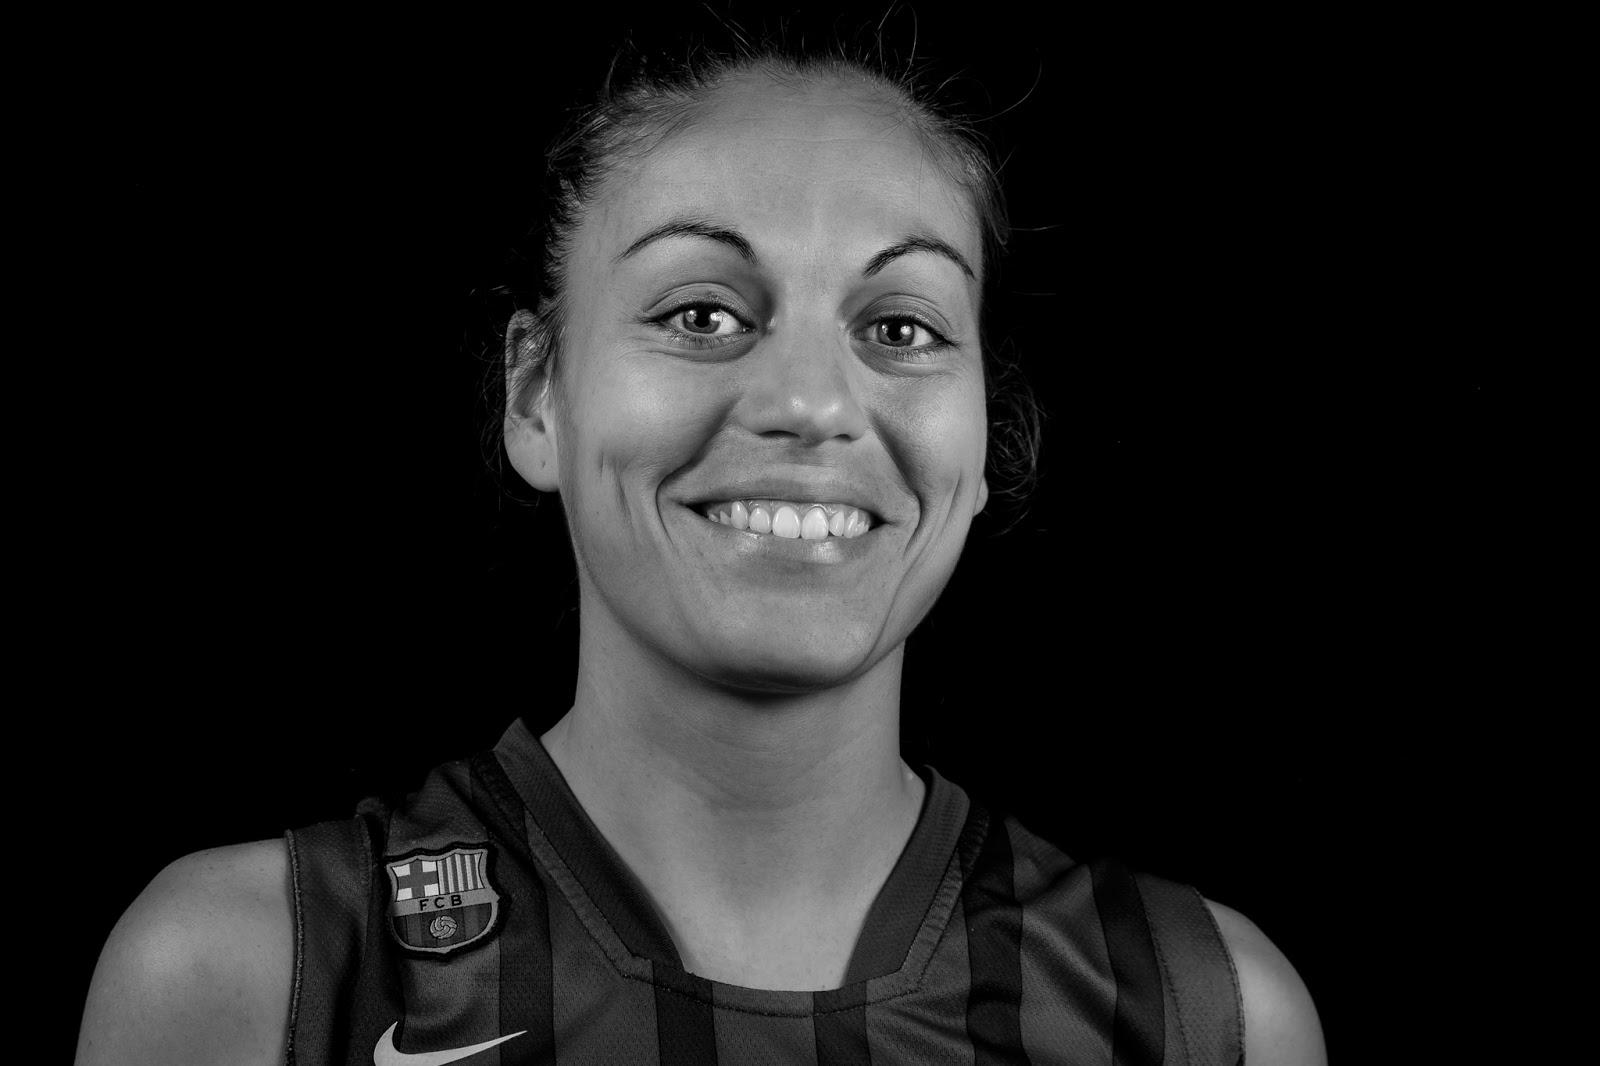 Raquel 08 - CBS Barça Senior Femenino A - 2013 :: Canon EOS 5D MkIII | ISO100 | Canon 24-105 @58mm | f/11 | 1/60s